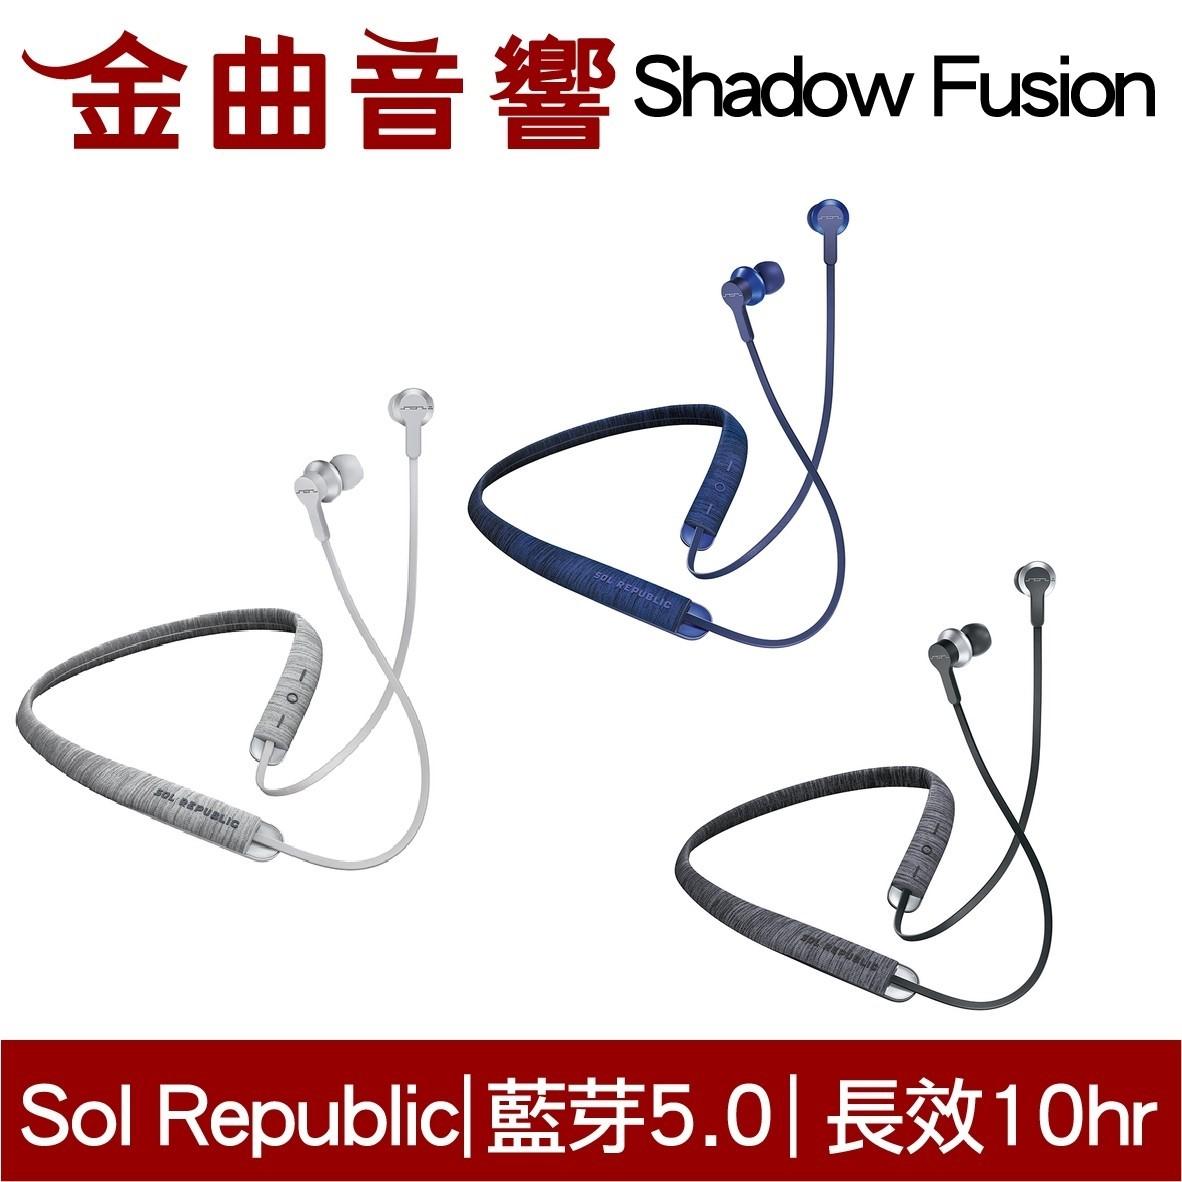 SOL REPUBLIC Shadow Fusion 黑色 頸掛式藍牙耳機 | 金曲音響